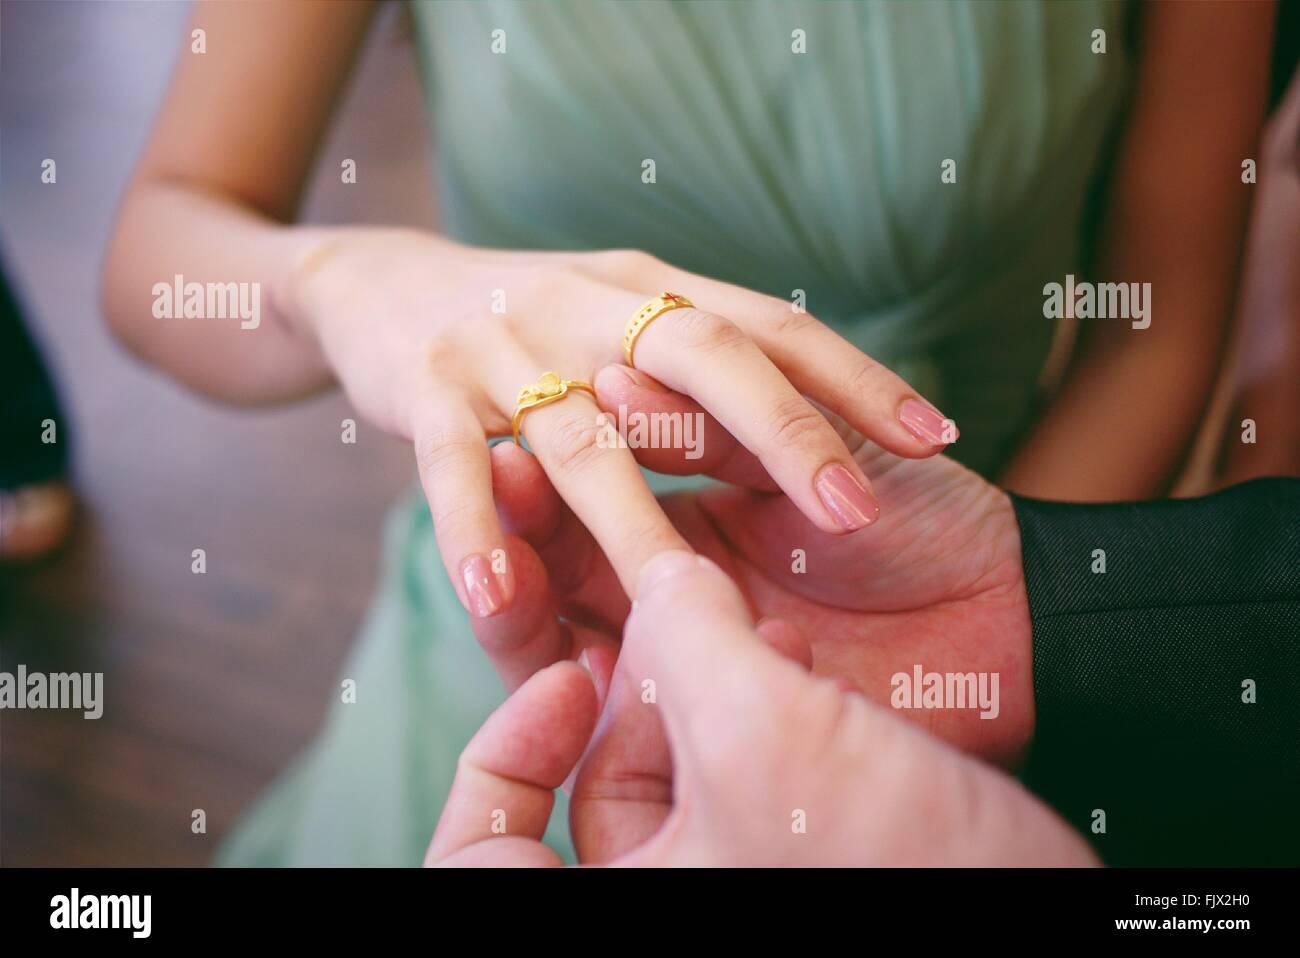 Cropped Image Of Groom Putting Wedding Ring On Bride Finger - Stock Image